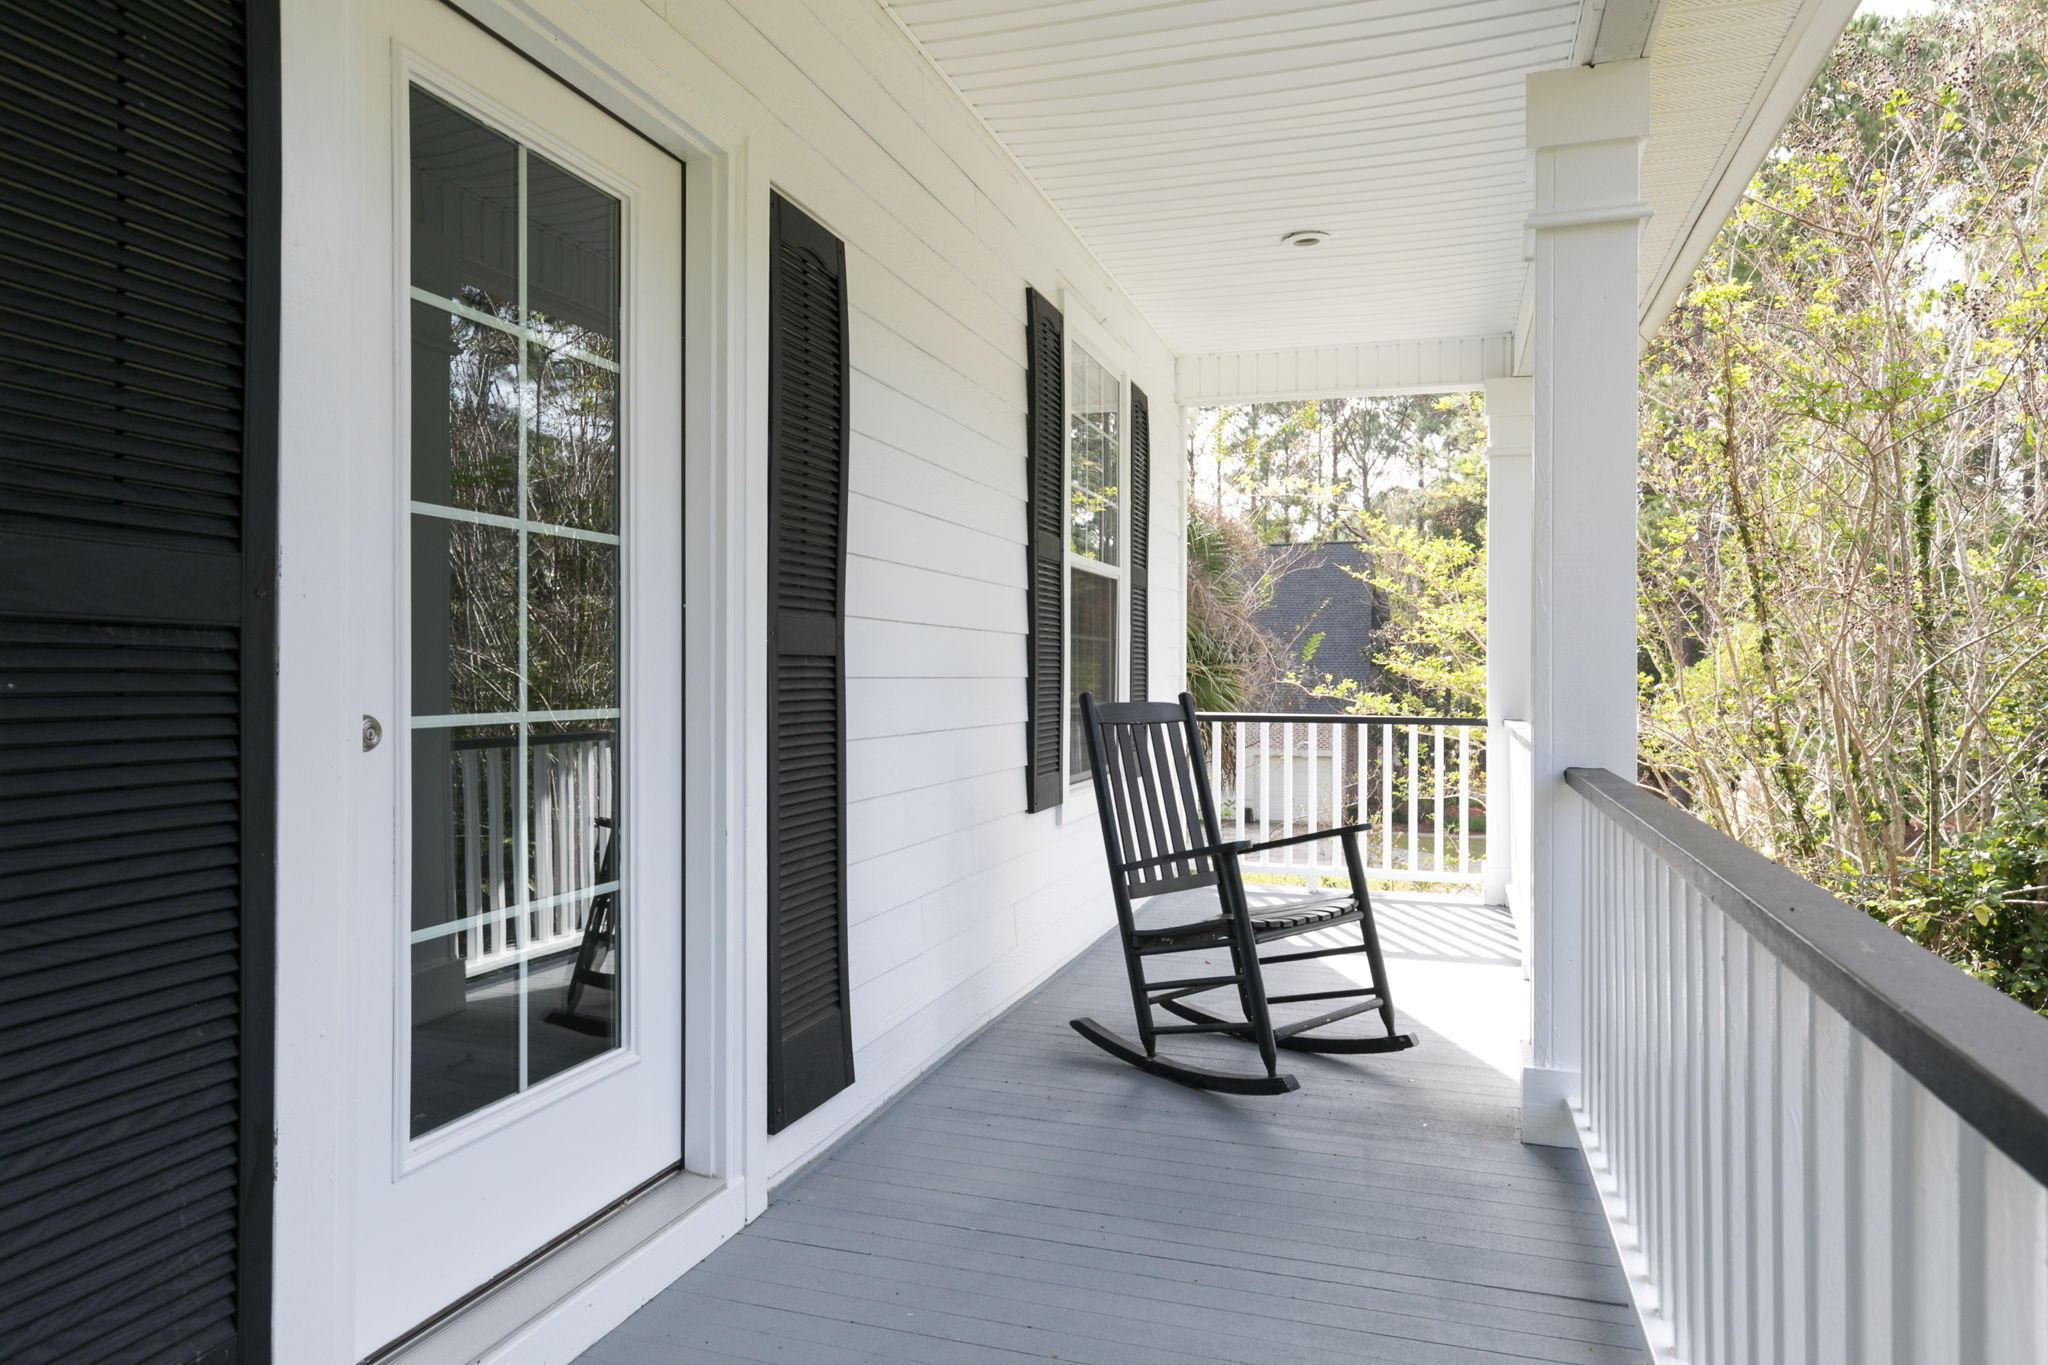 Dunes West Homes For Sale - 3625 Colonel Vanderhorst, Mount Pleasant, SC - 12